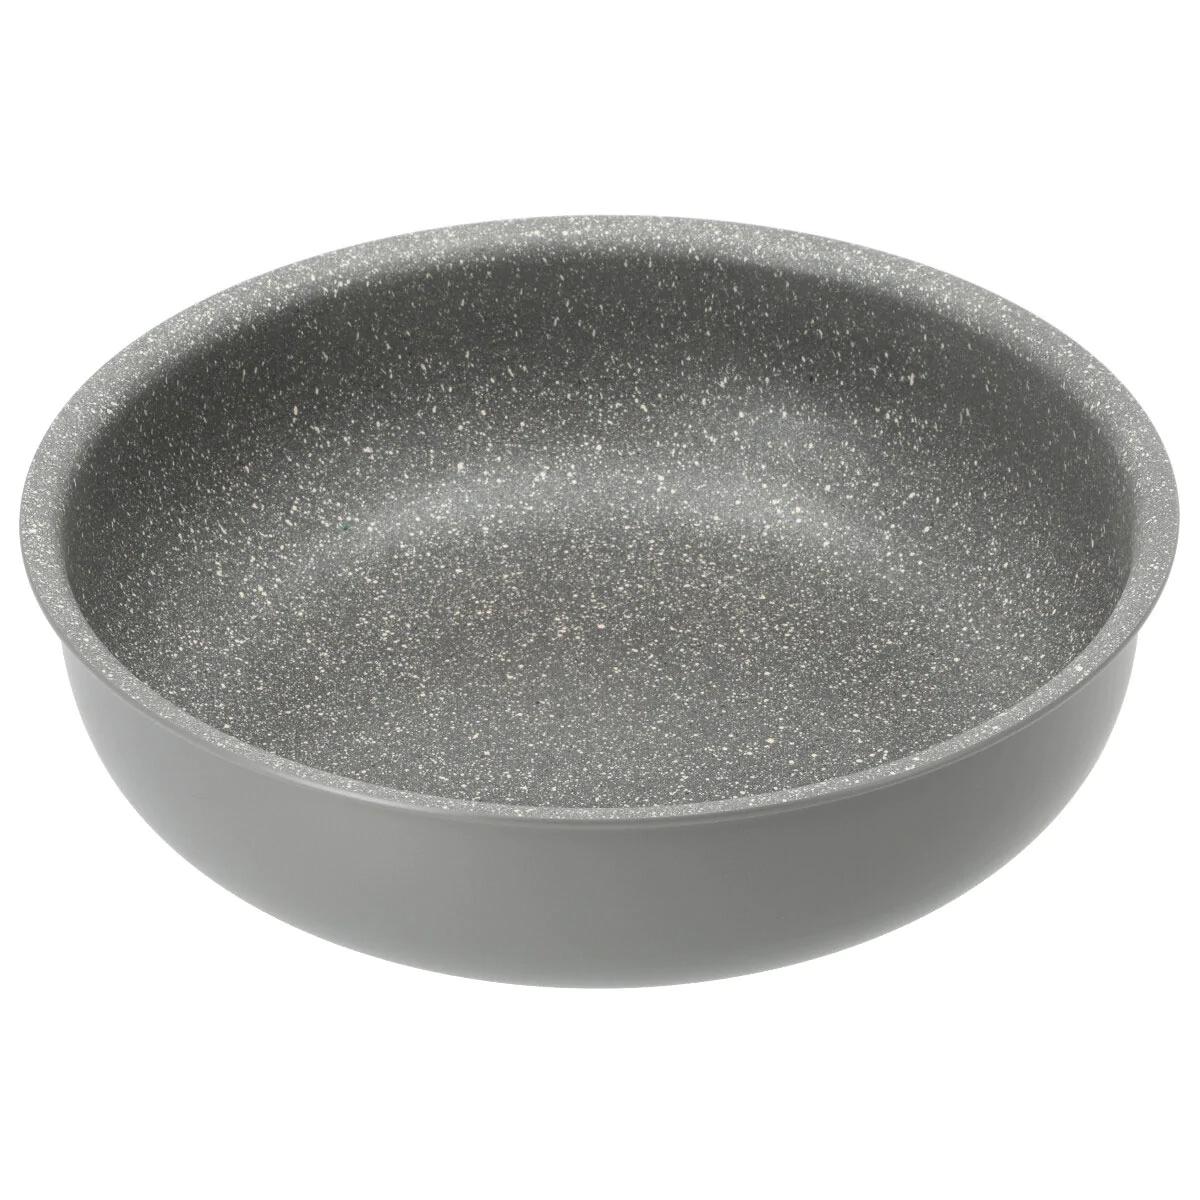 NITORI(ニトリ) 深型フライパン TORERUの商品画像